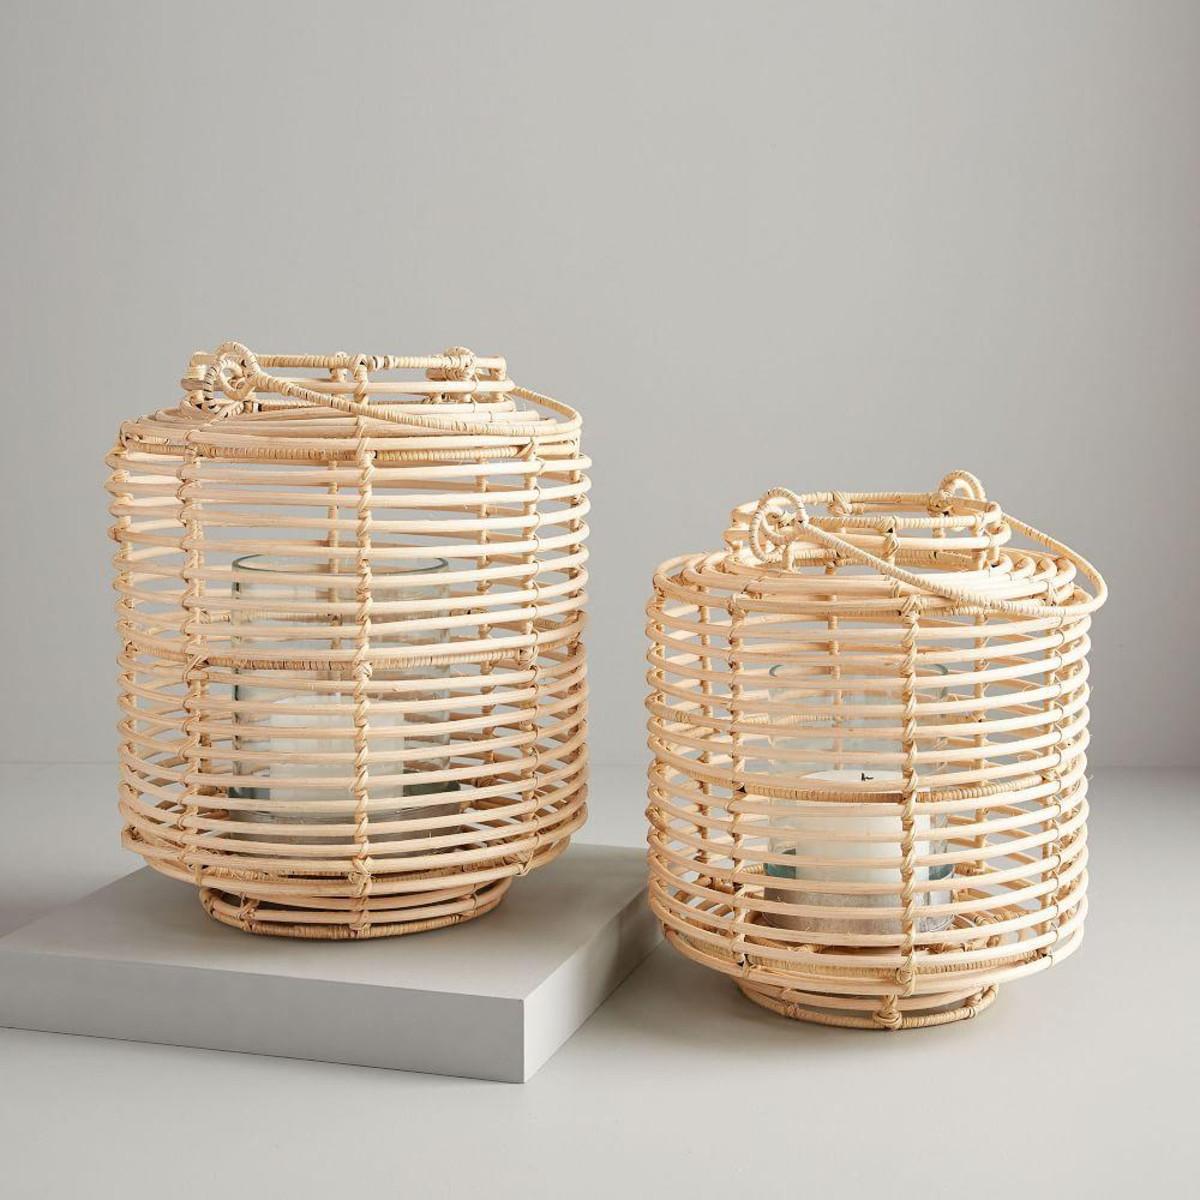 natural-rattan-lanterns-d6043-alt1_imgz-1